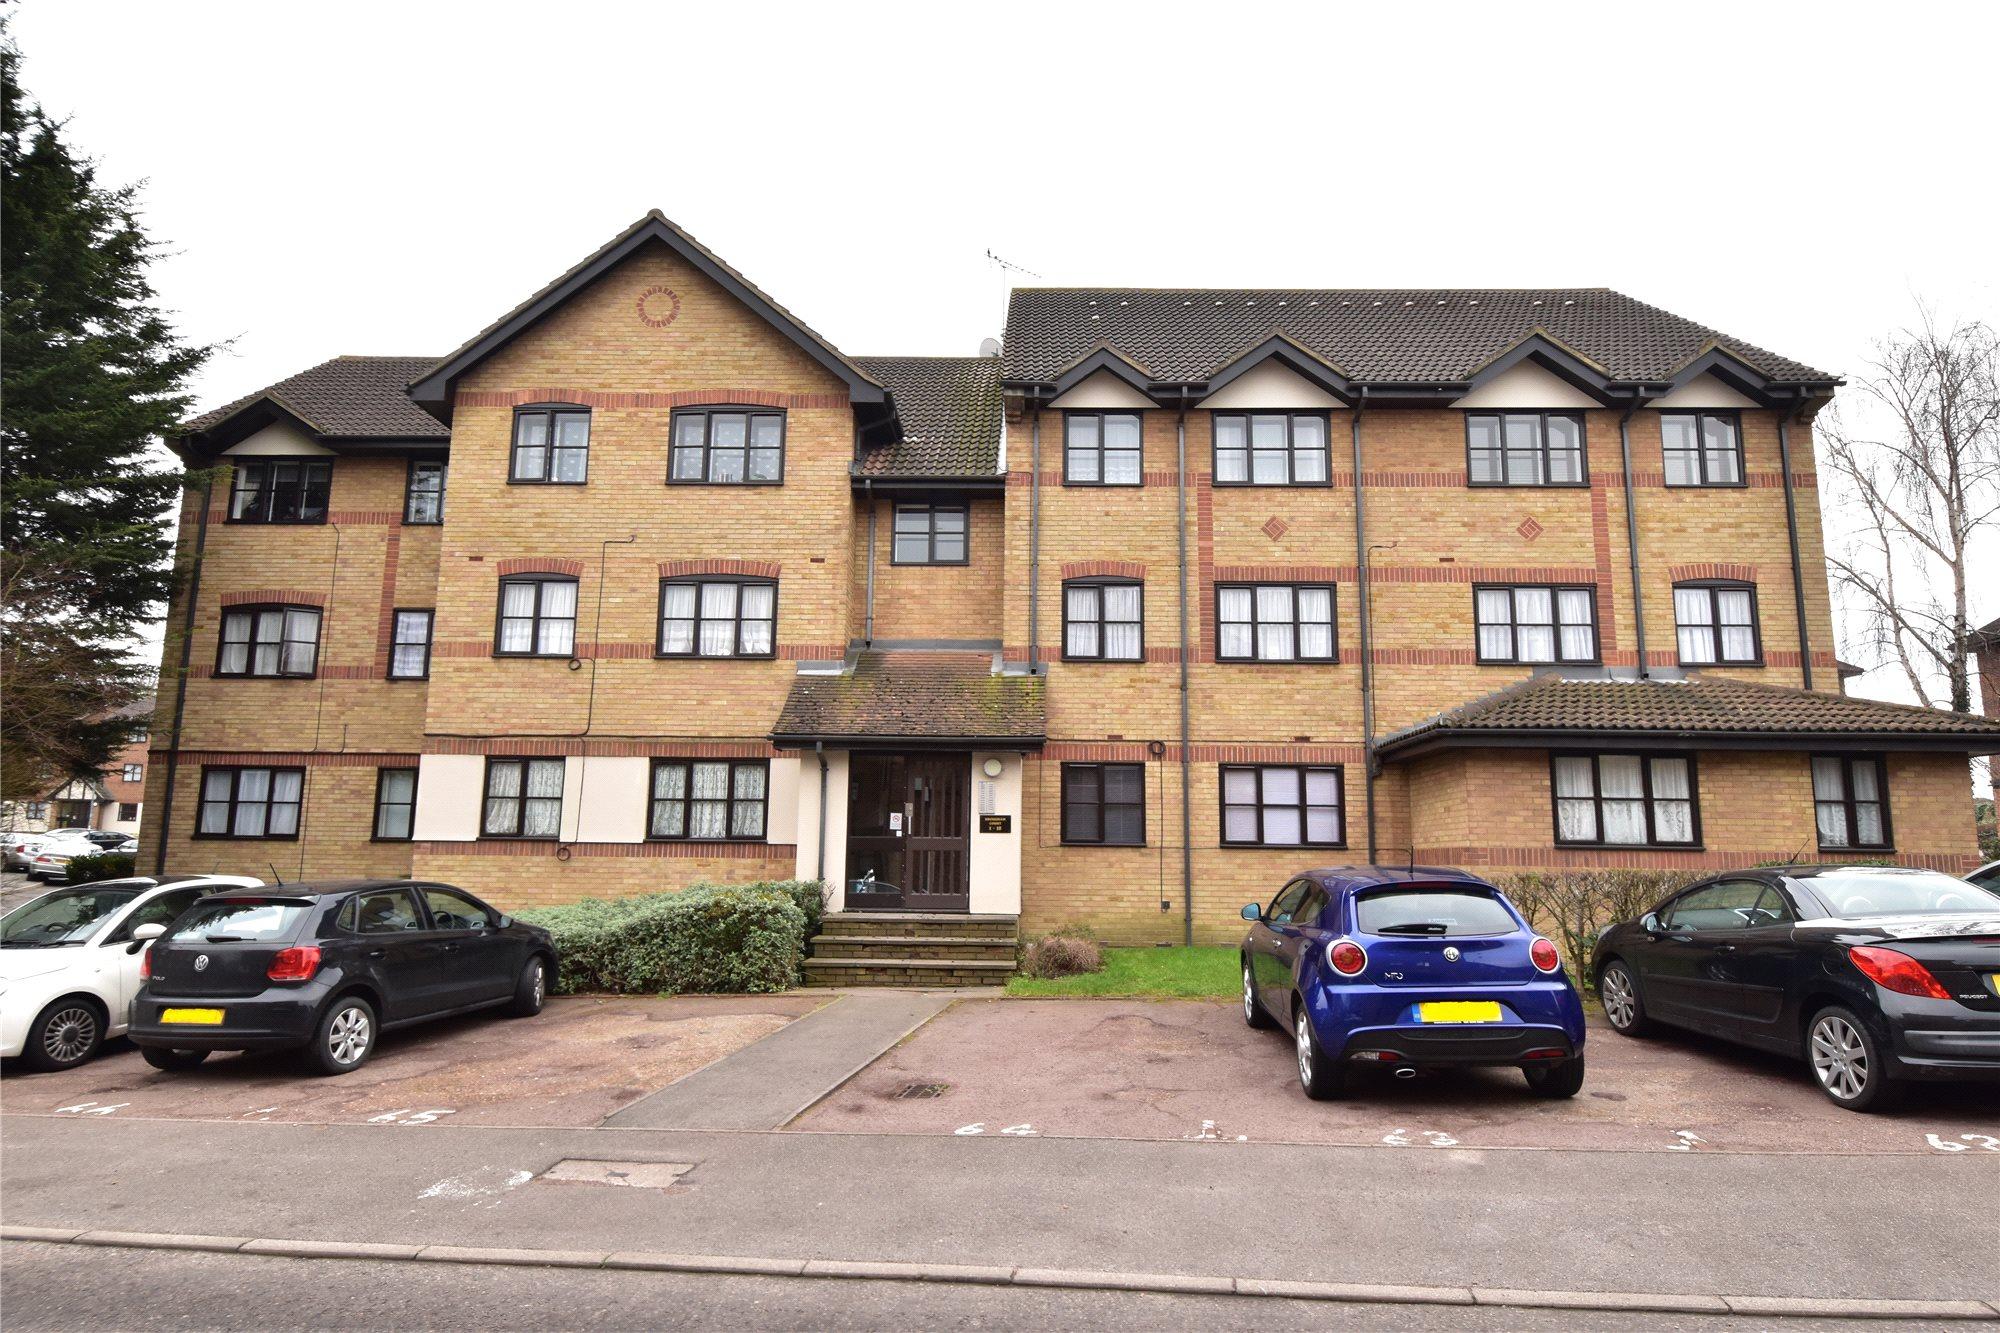 Brougham Court, Hardwick Crescent, Dartford, Kent, DA2